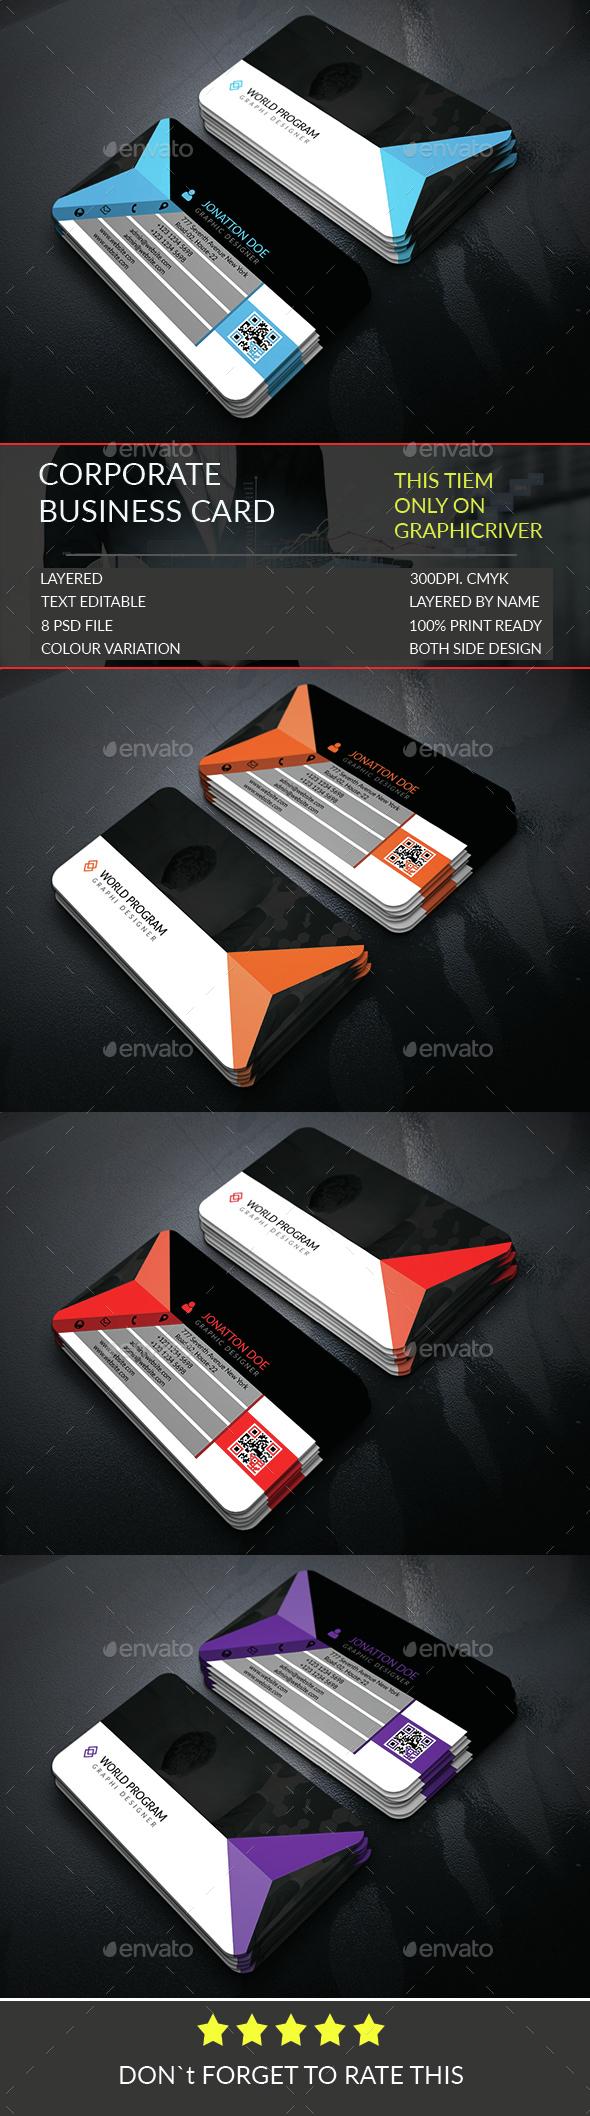 Corporate Business Card Template.252 - Corporate Business Cards